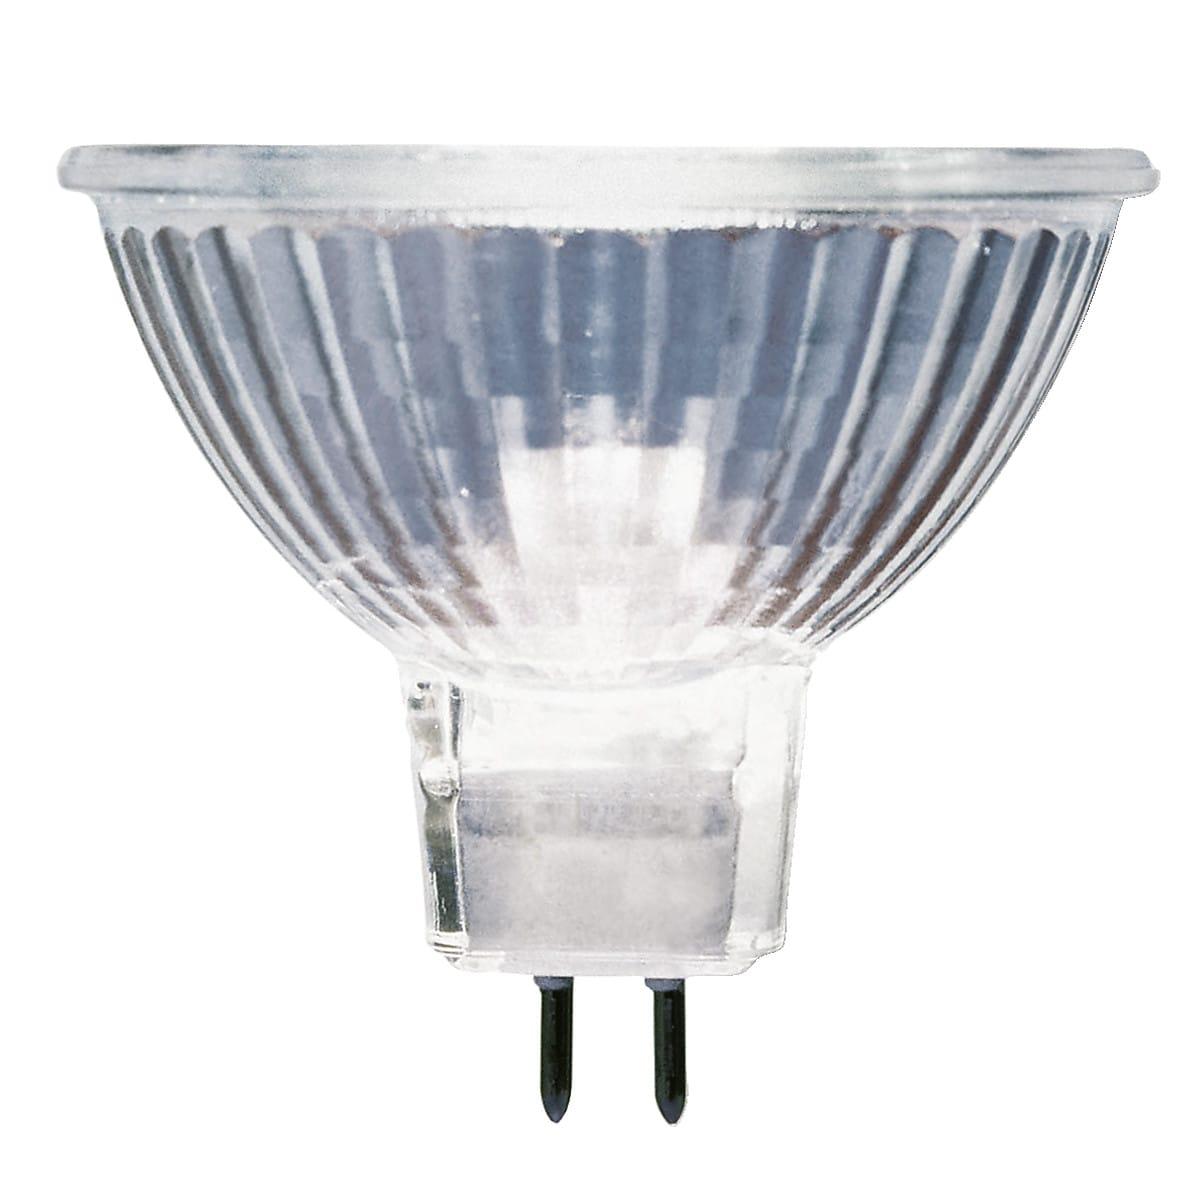 Halogenlampa GU5.3 Osram Decostar